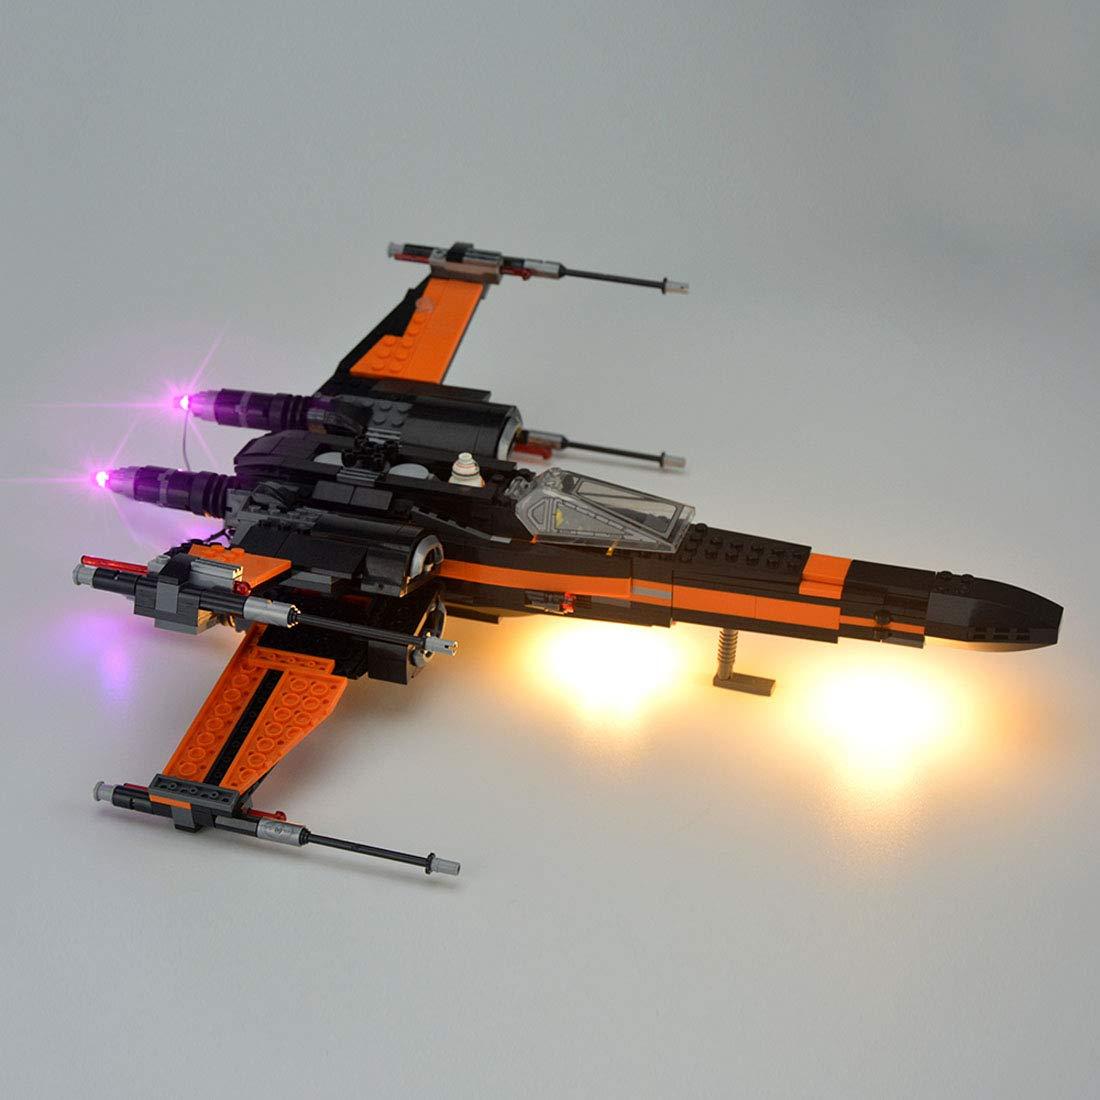 TLJ Poe's X-Wing Fighter Lighting Lego set 3